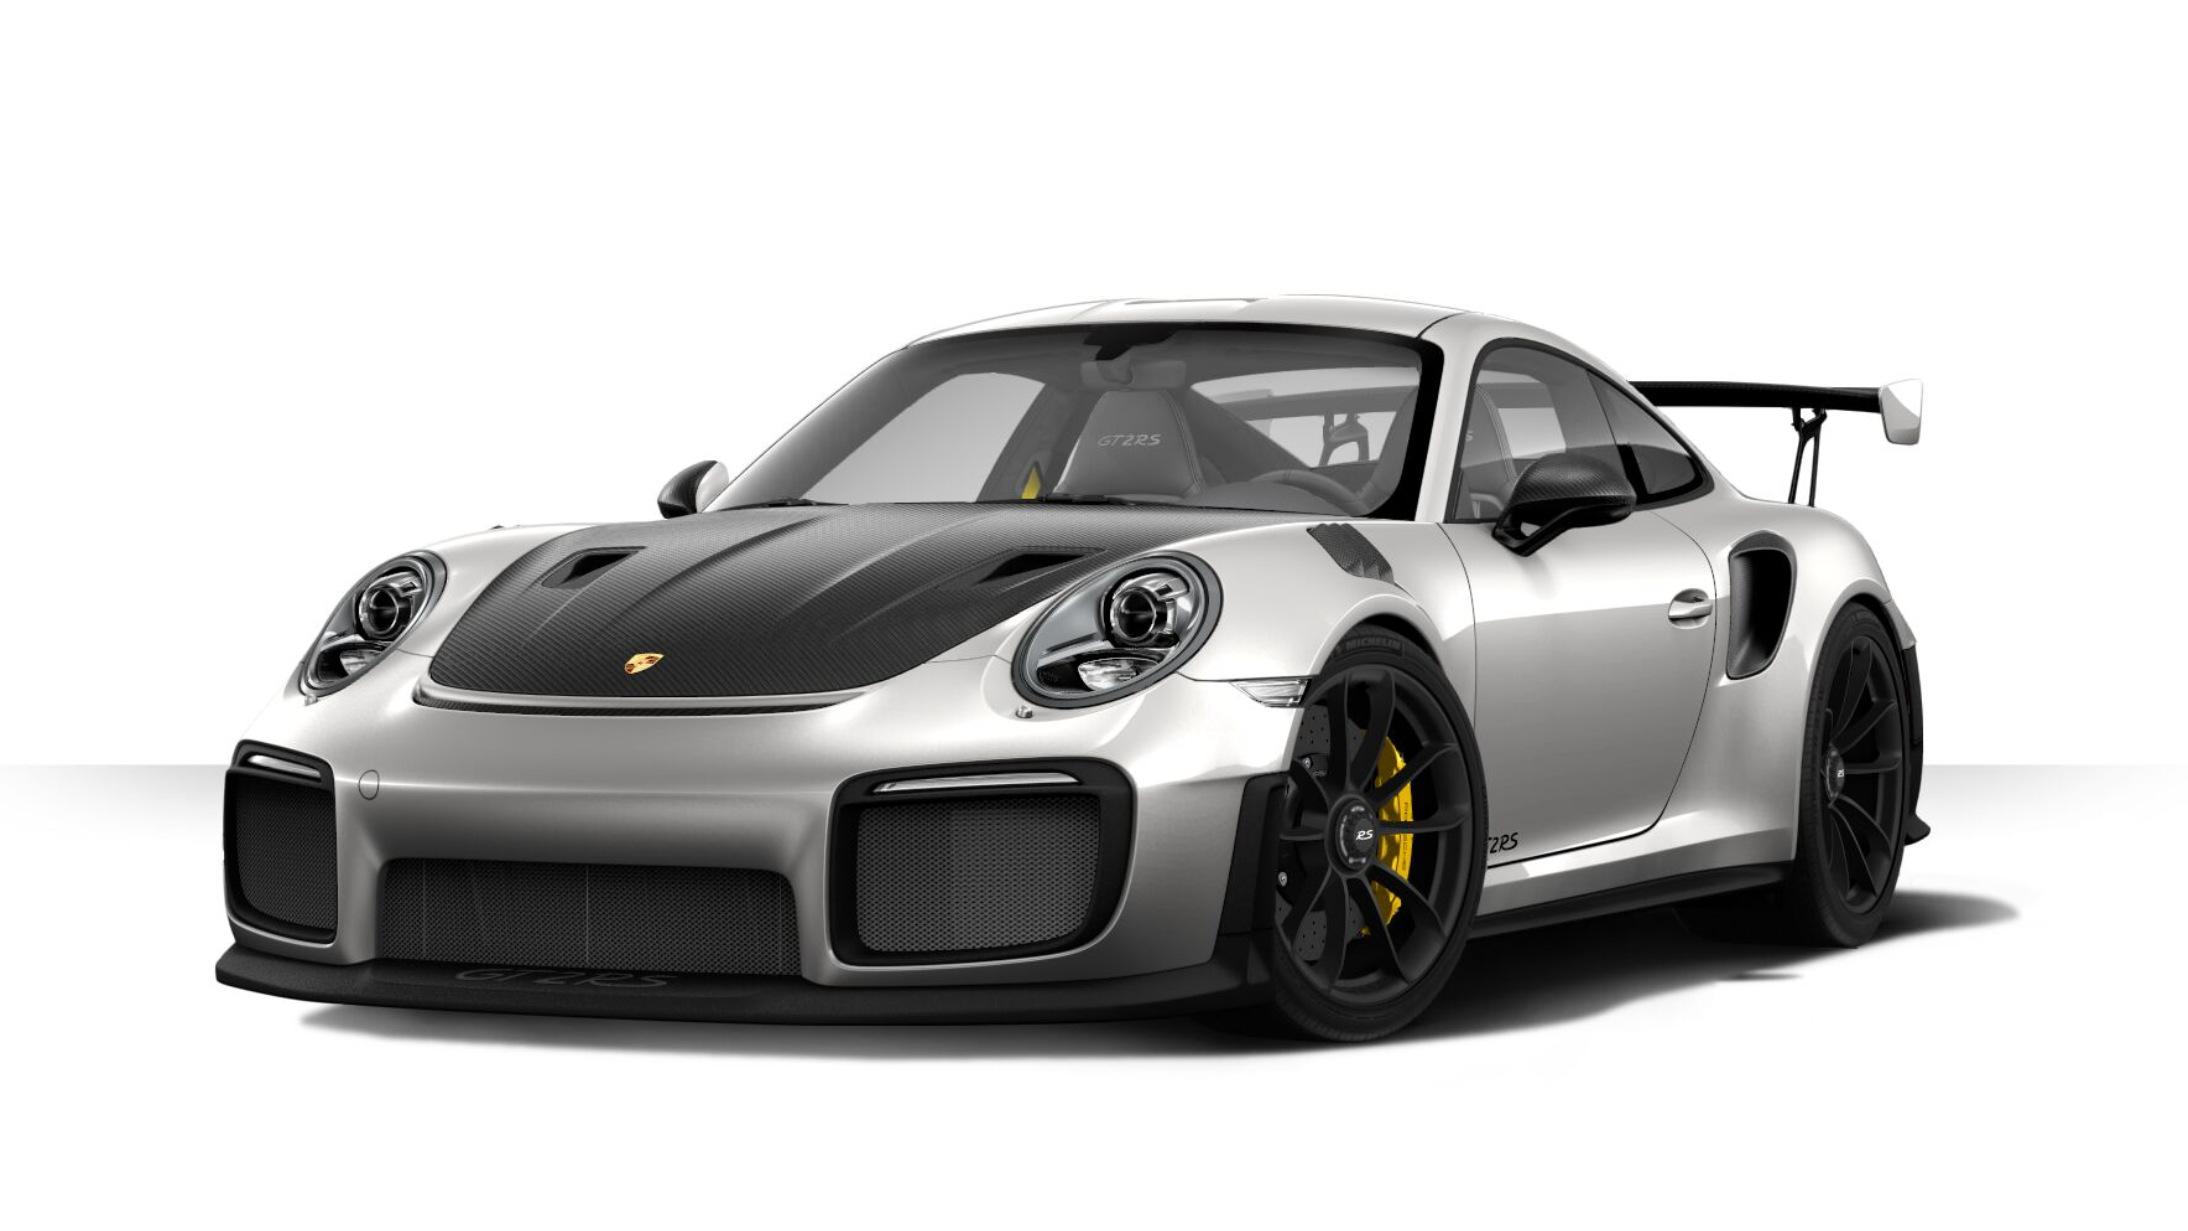 0d0022d5302c27e63e46de7de7b9dcdf Fascinating Porsche 911 Gt2 Rs Vs Gt3 Rs Cars Trend